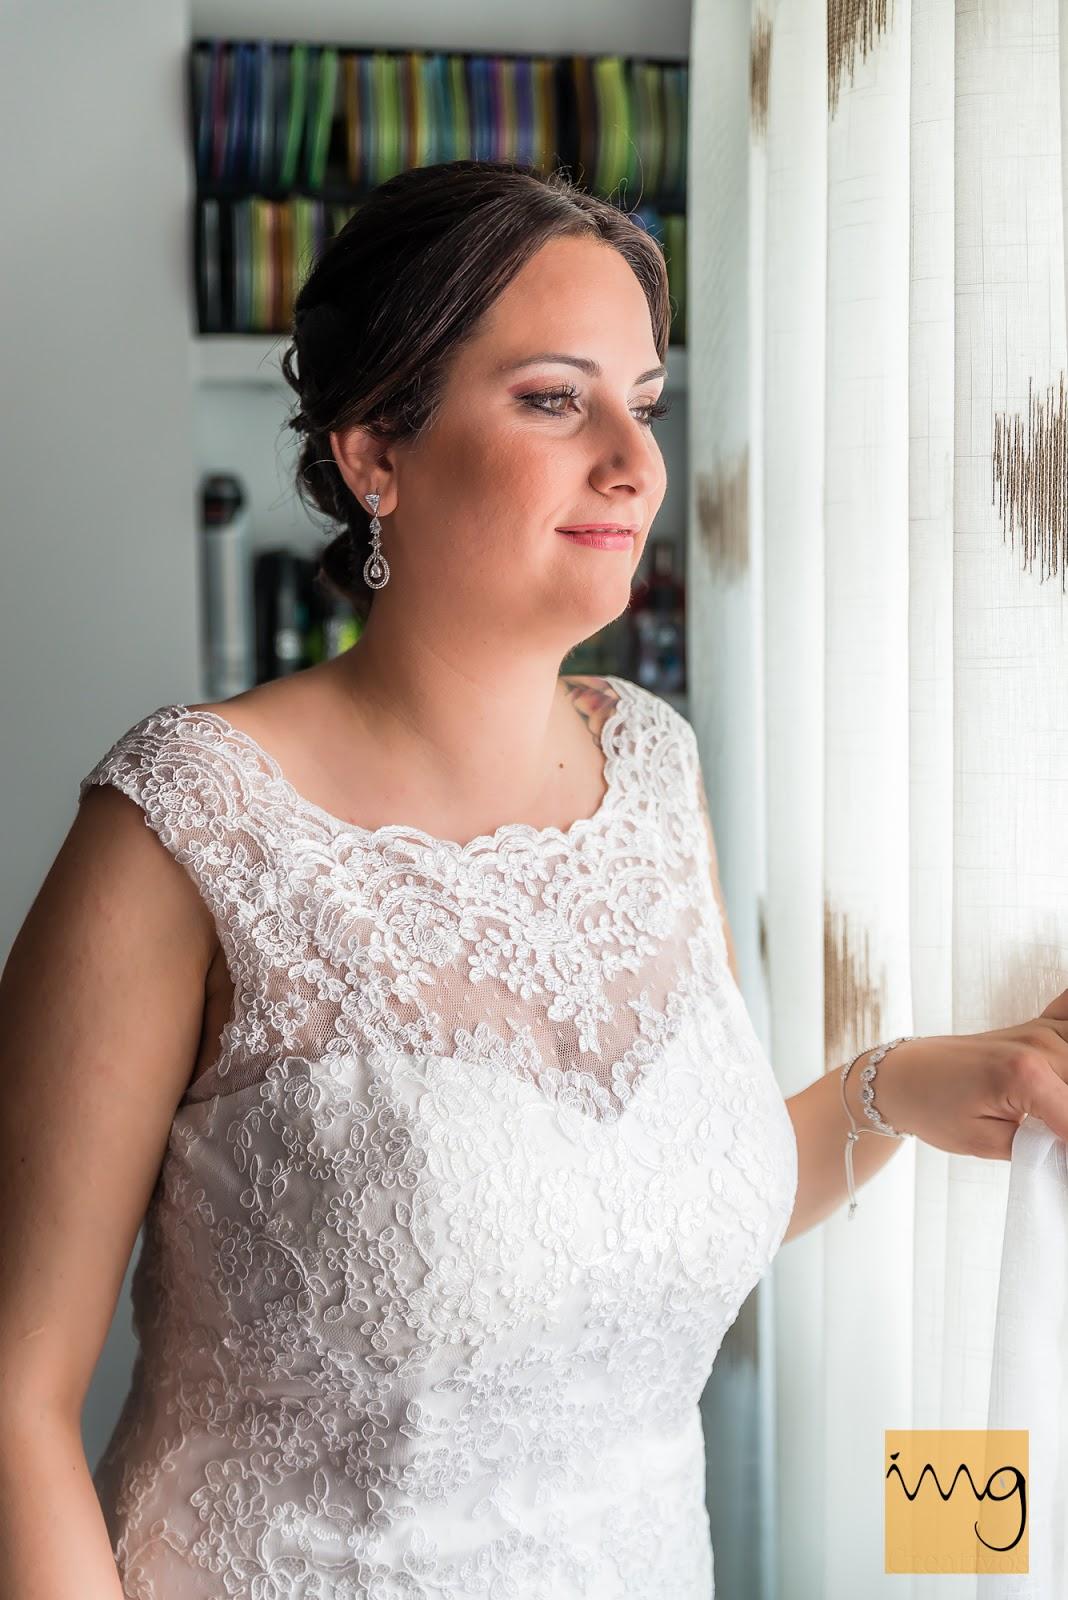 Fotografía de la novia a la luz de la ventana